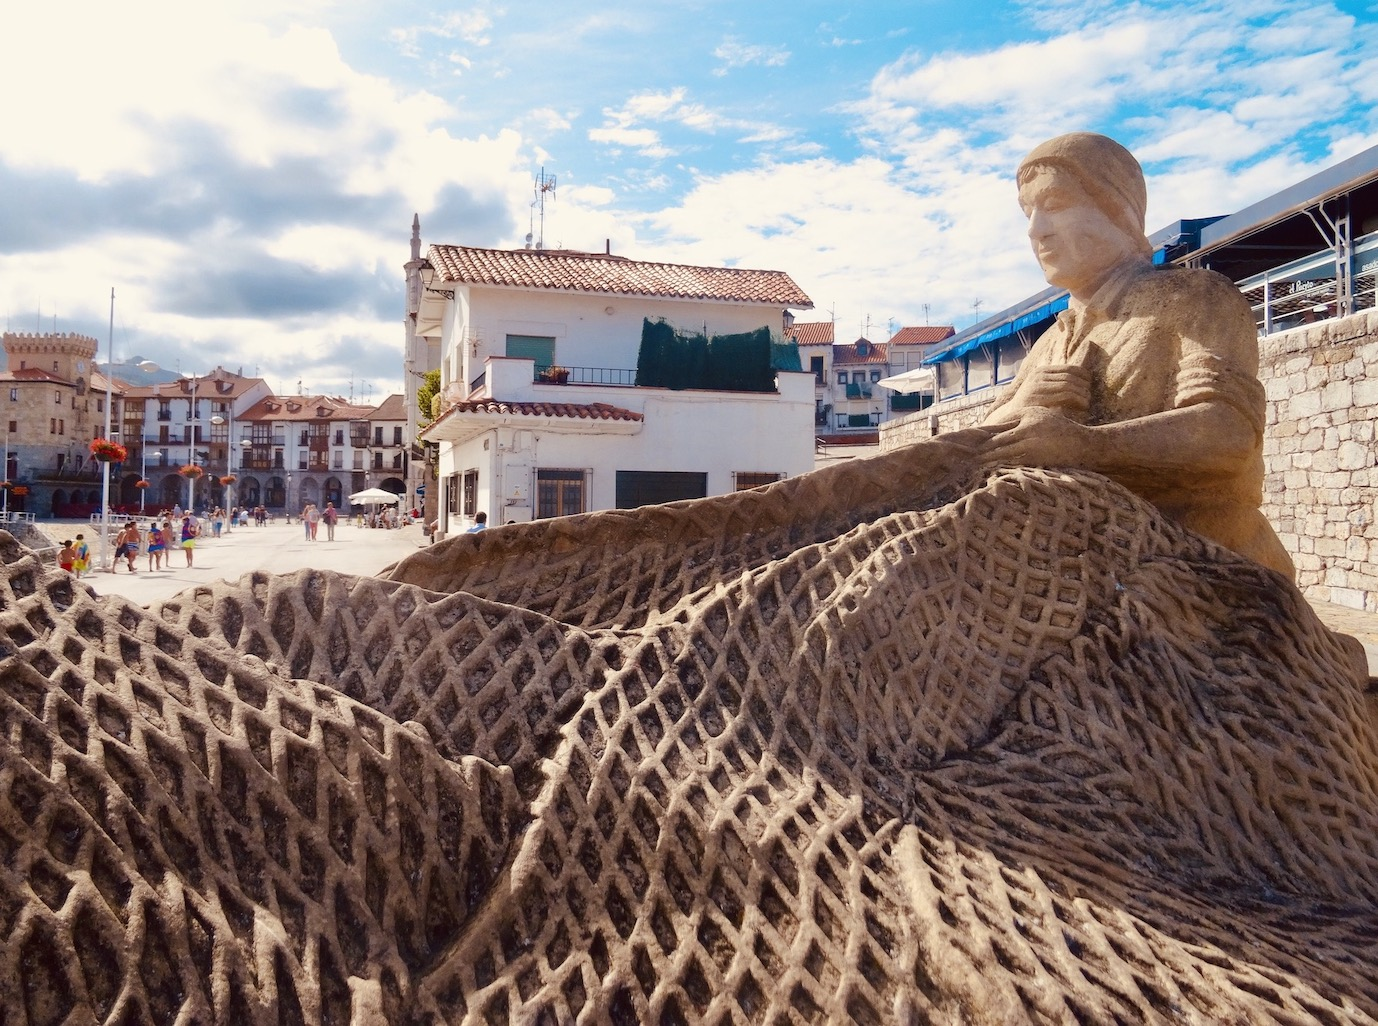 Fishing net sculpture Castro Urdiales.